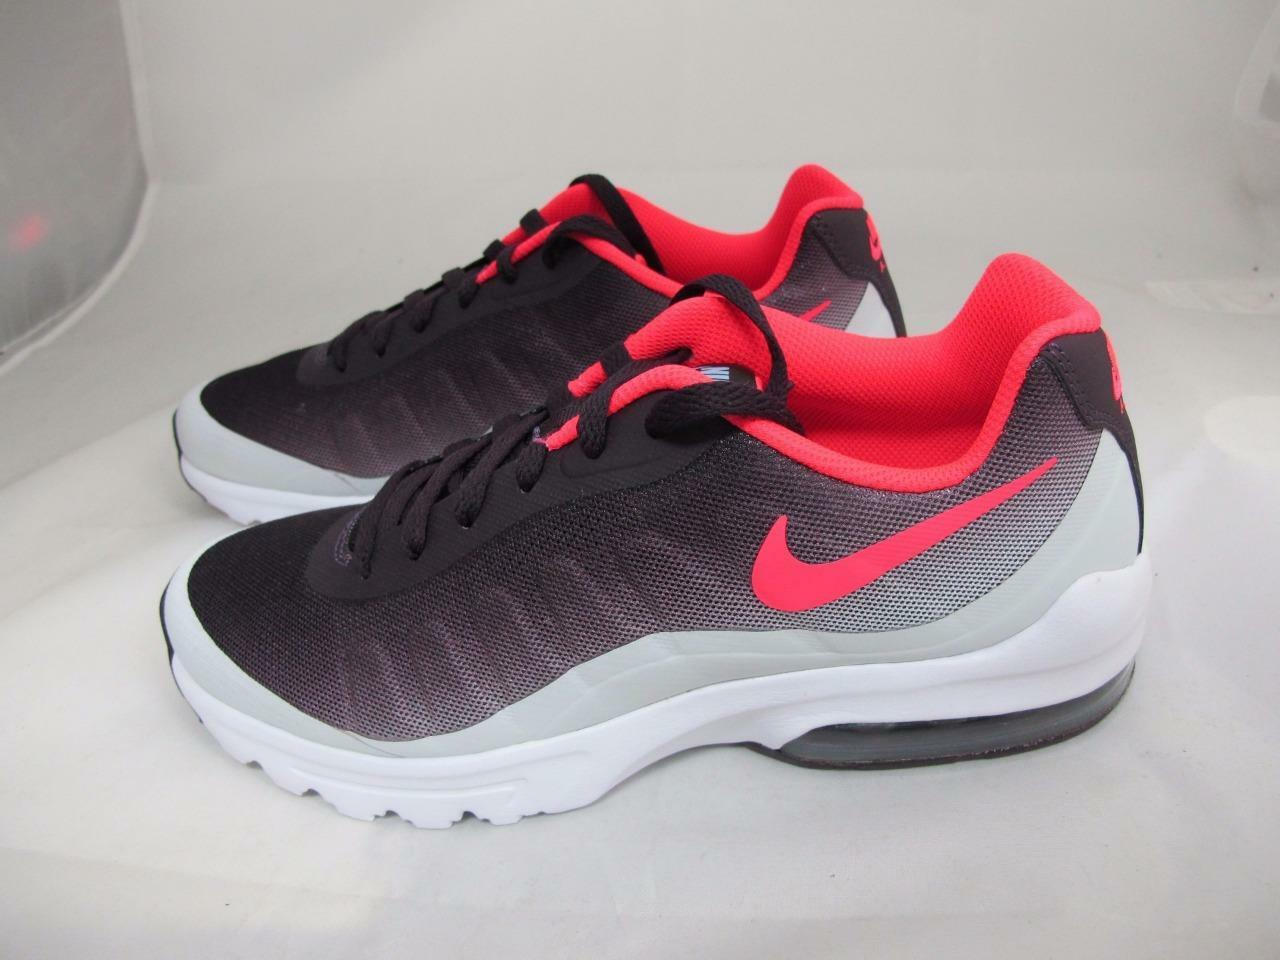 e34f44d869ef ... 90 hyperfuse ebay 587cd e3ffc  cheap nike mens air max invigor print  running shoe 9 ebay 1c978 cf26a